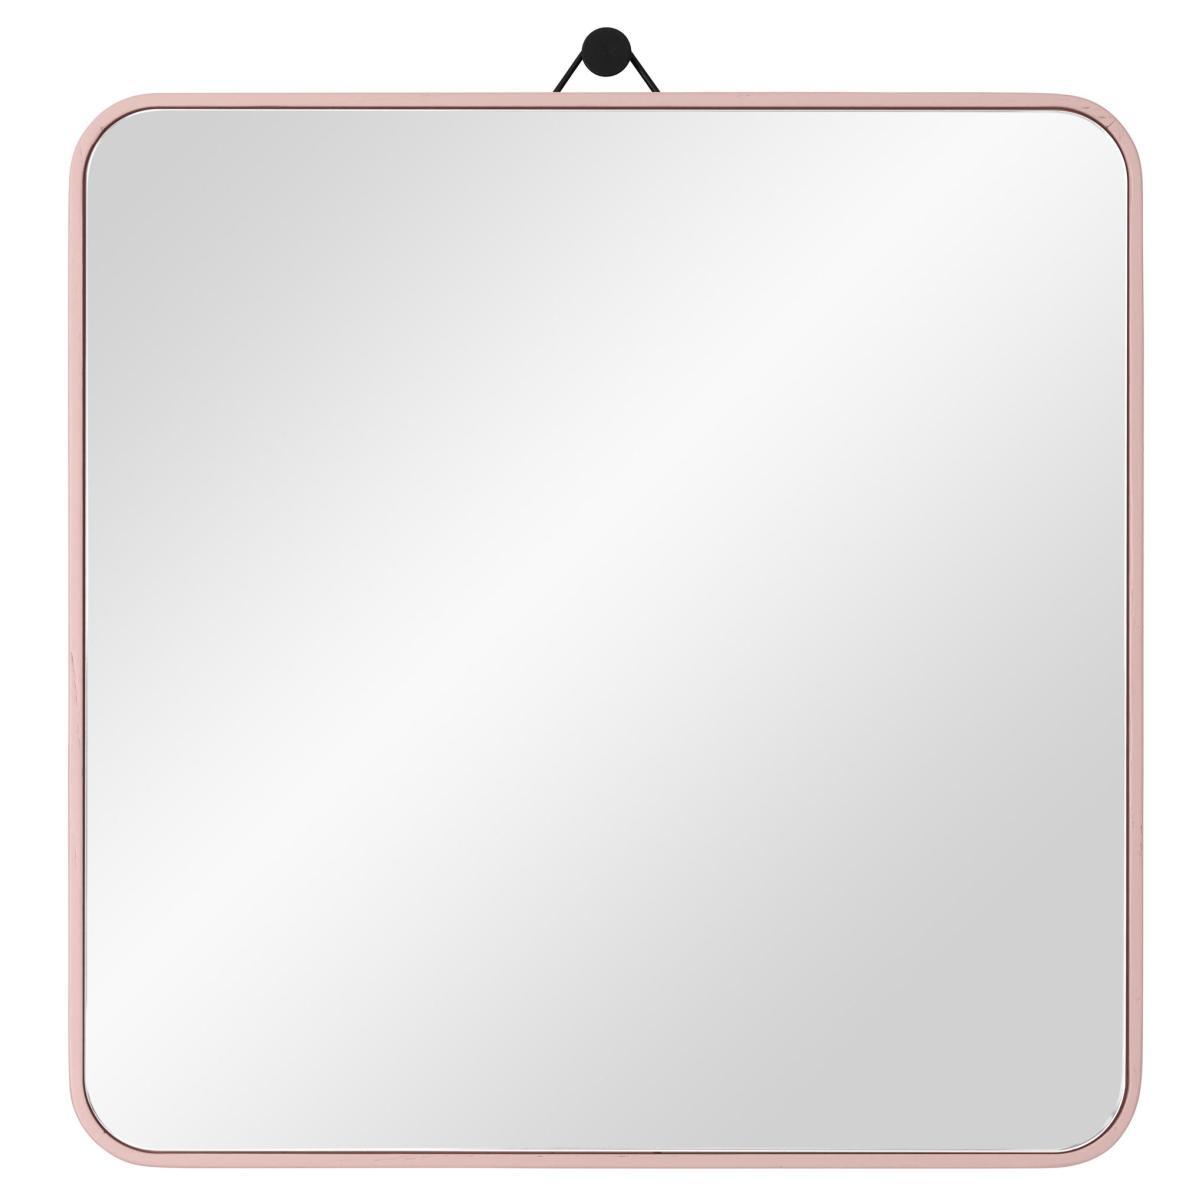 VIEW Spiegel 30 x 30 cm Eiche altrosa